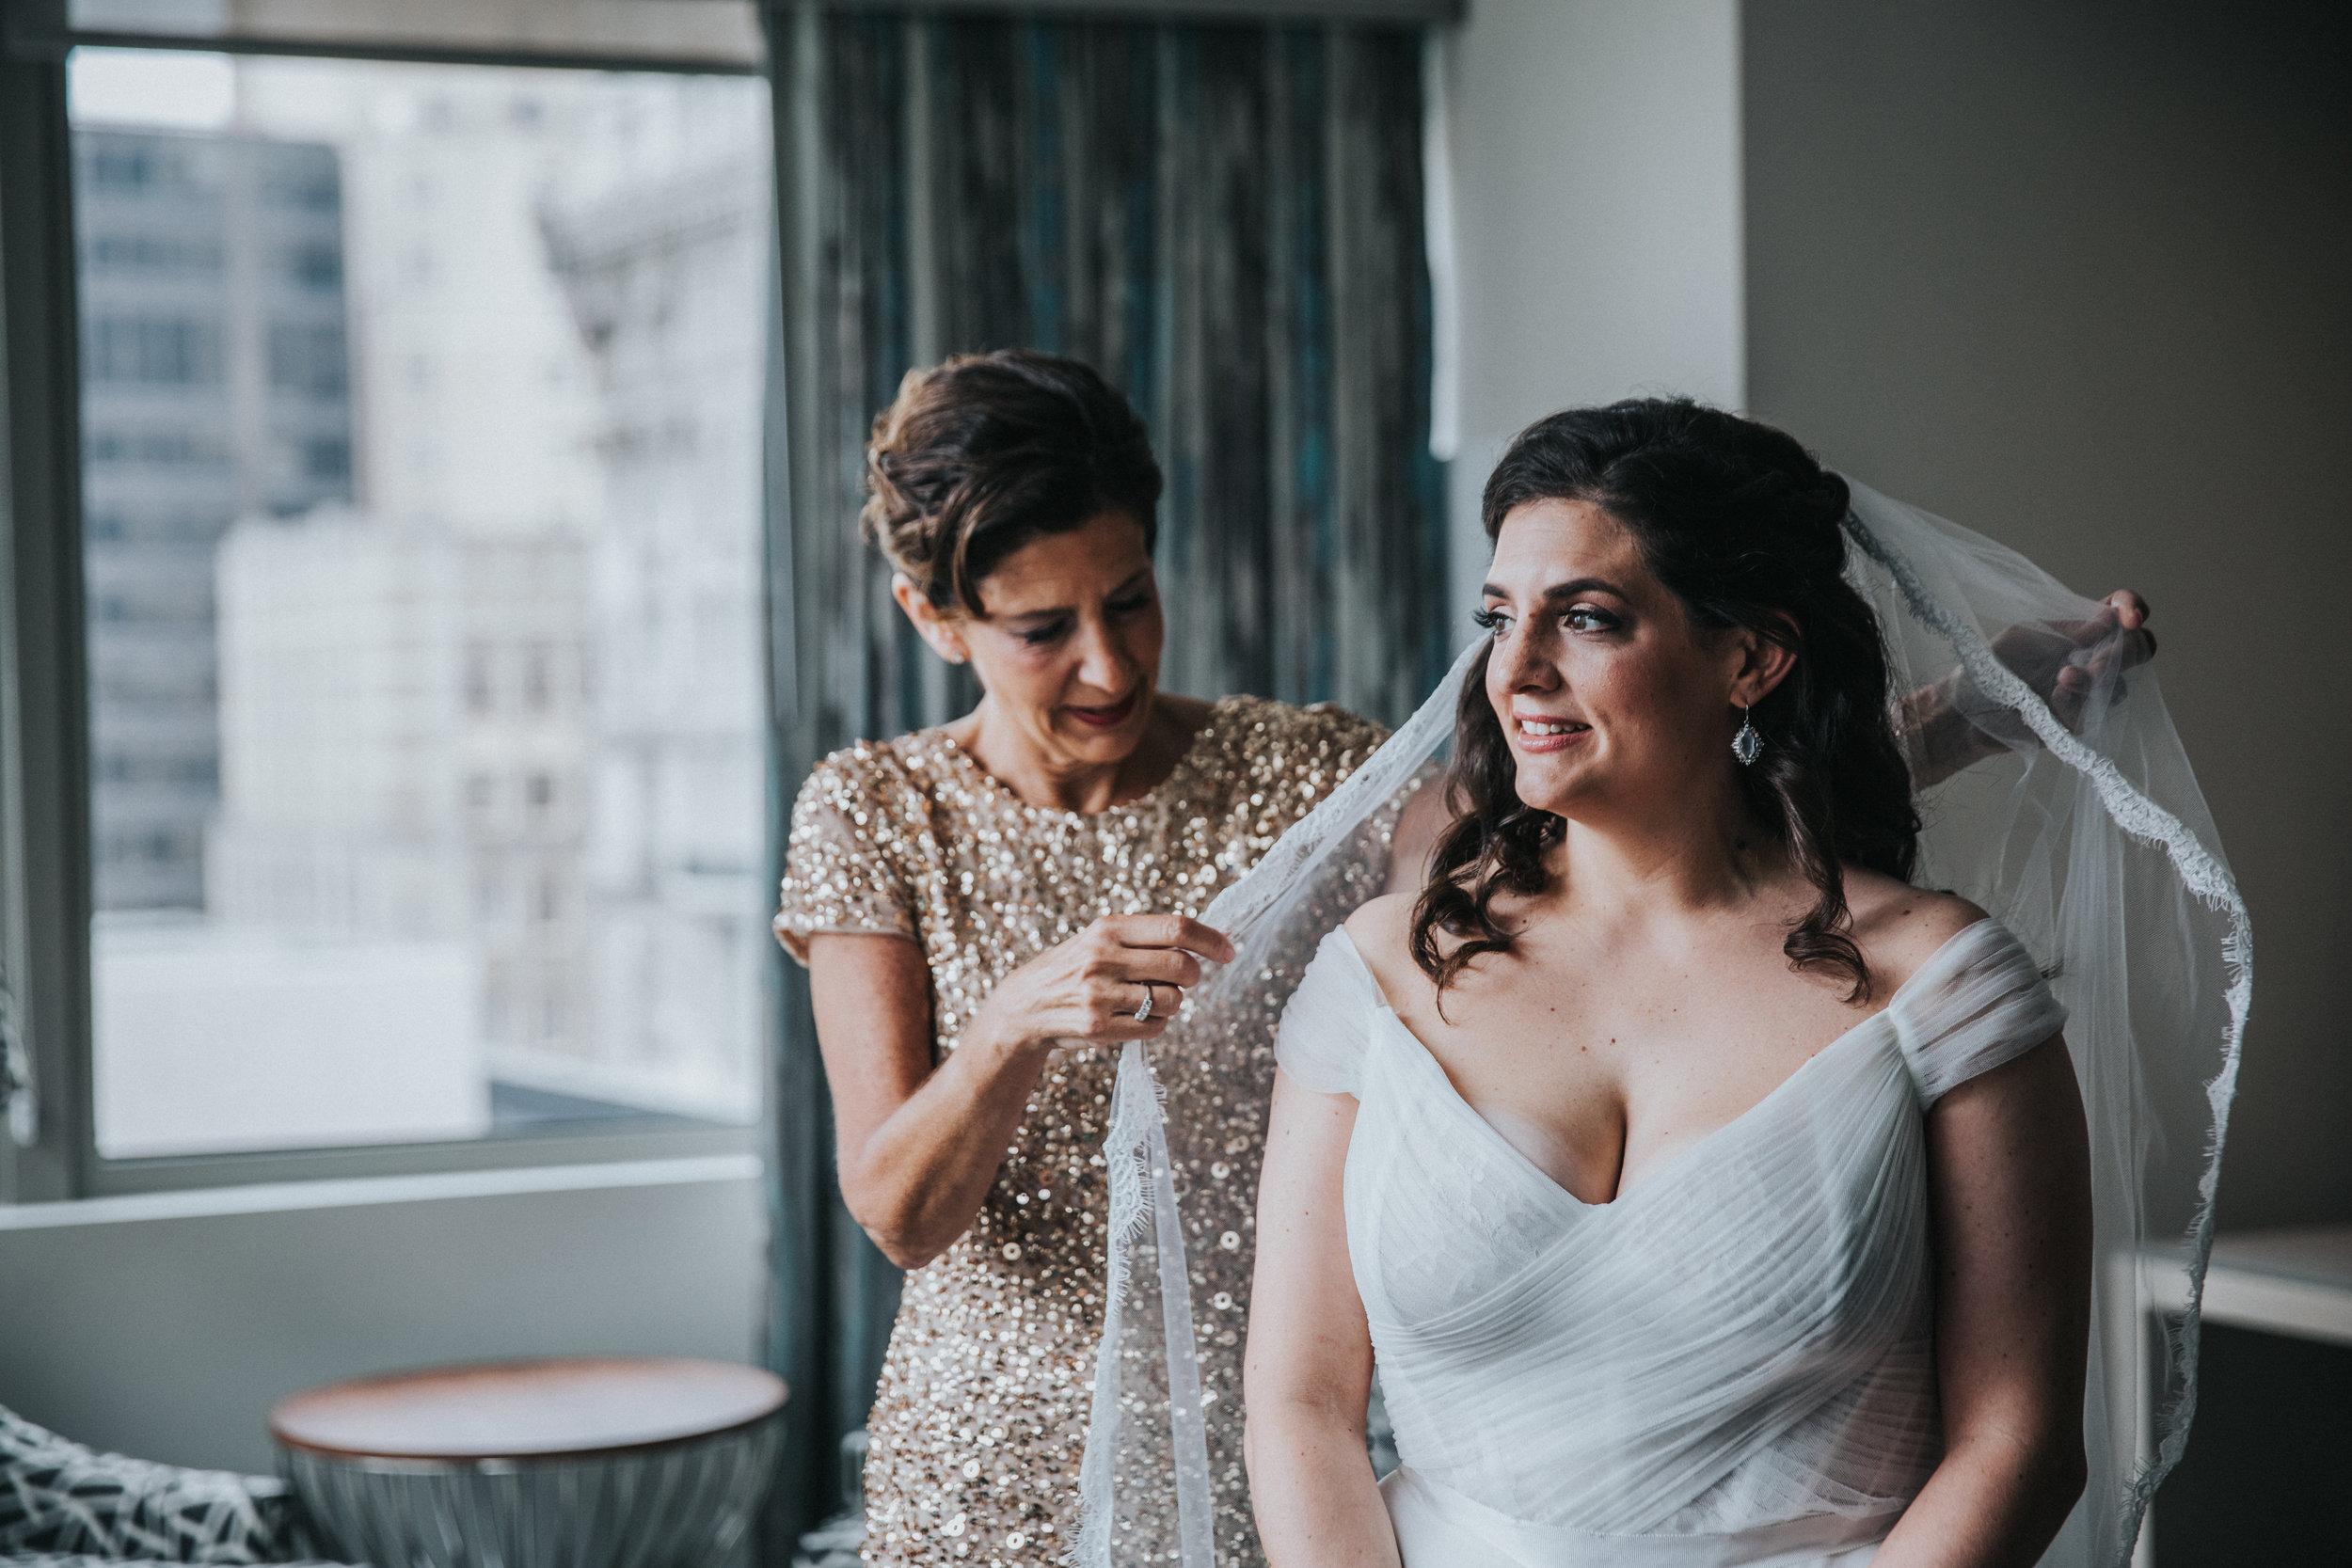 JennaLynnPhotography-NJWeddingPhotographer-Philadelphia-Wedding-ArtsBallroom-GettingReady-67.jpg